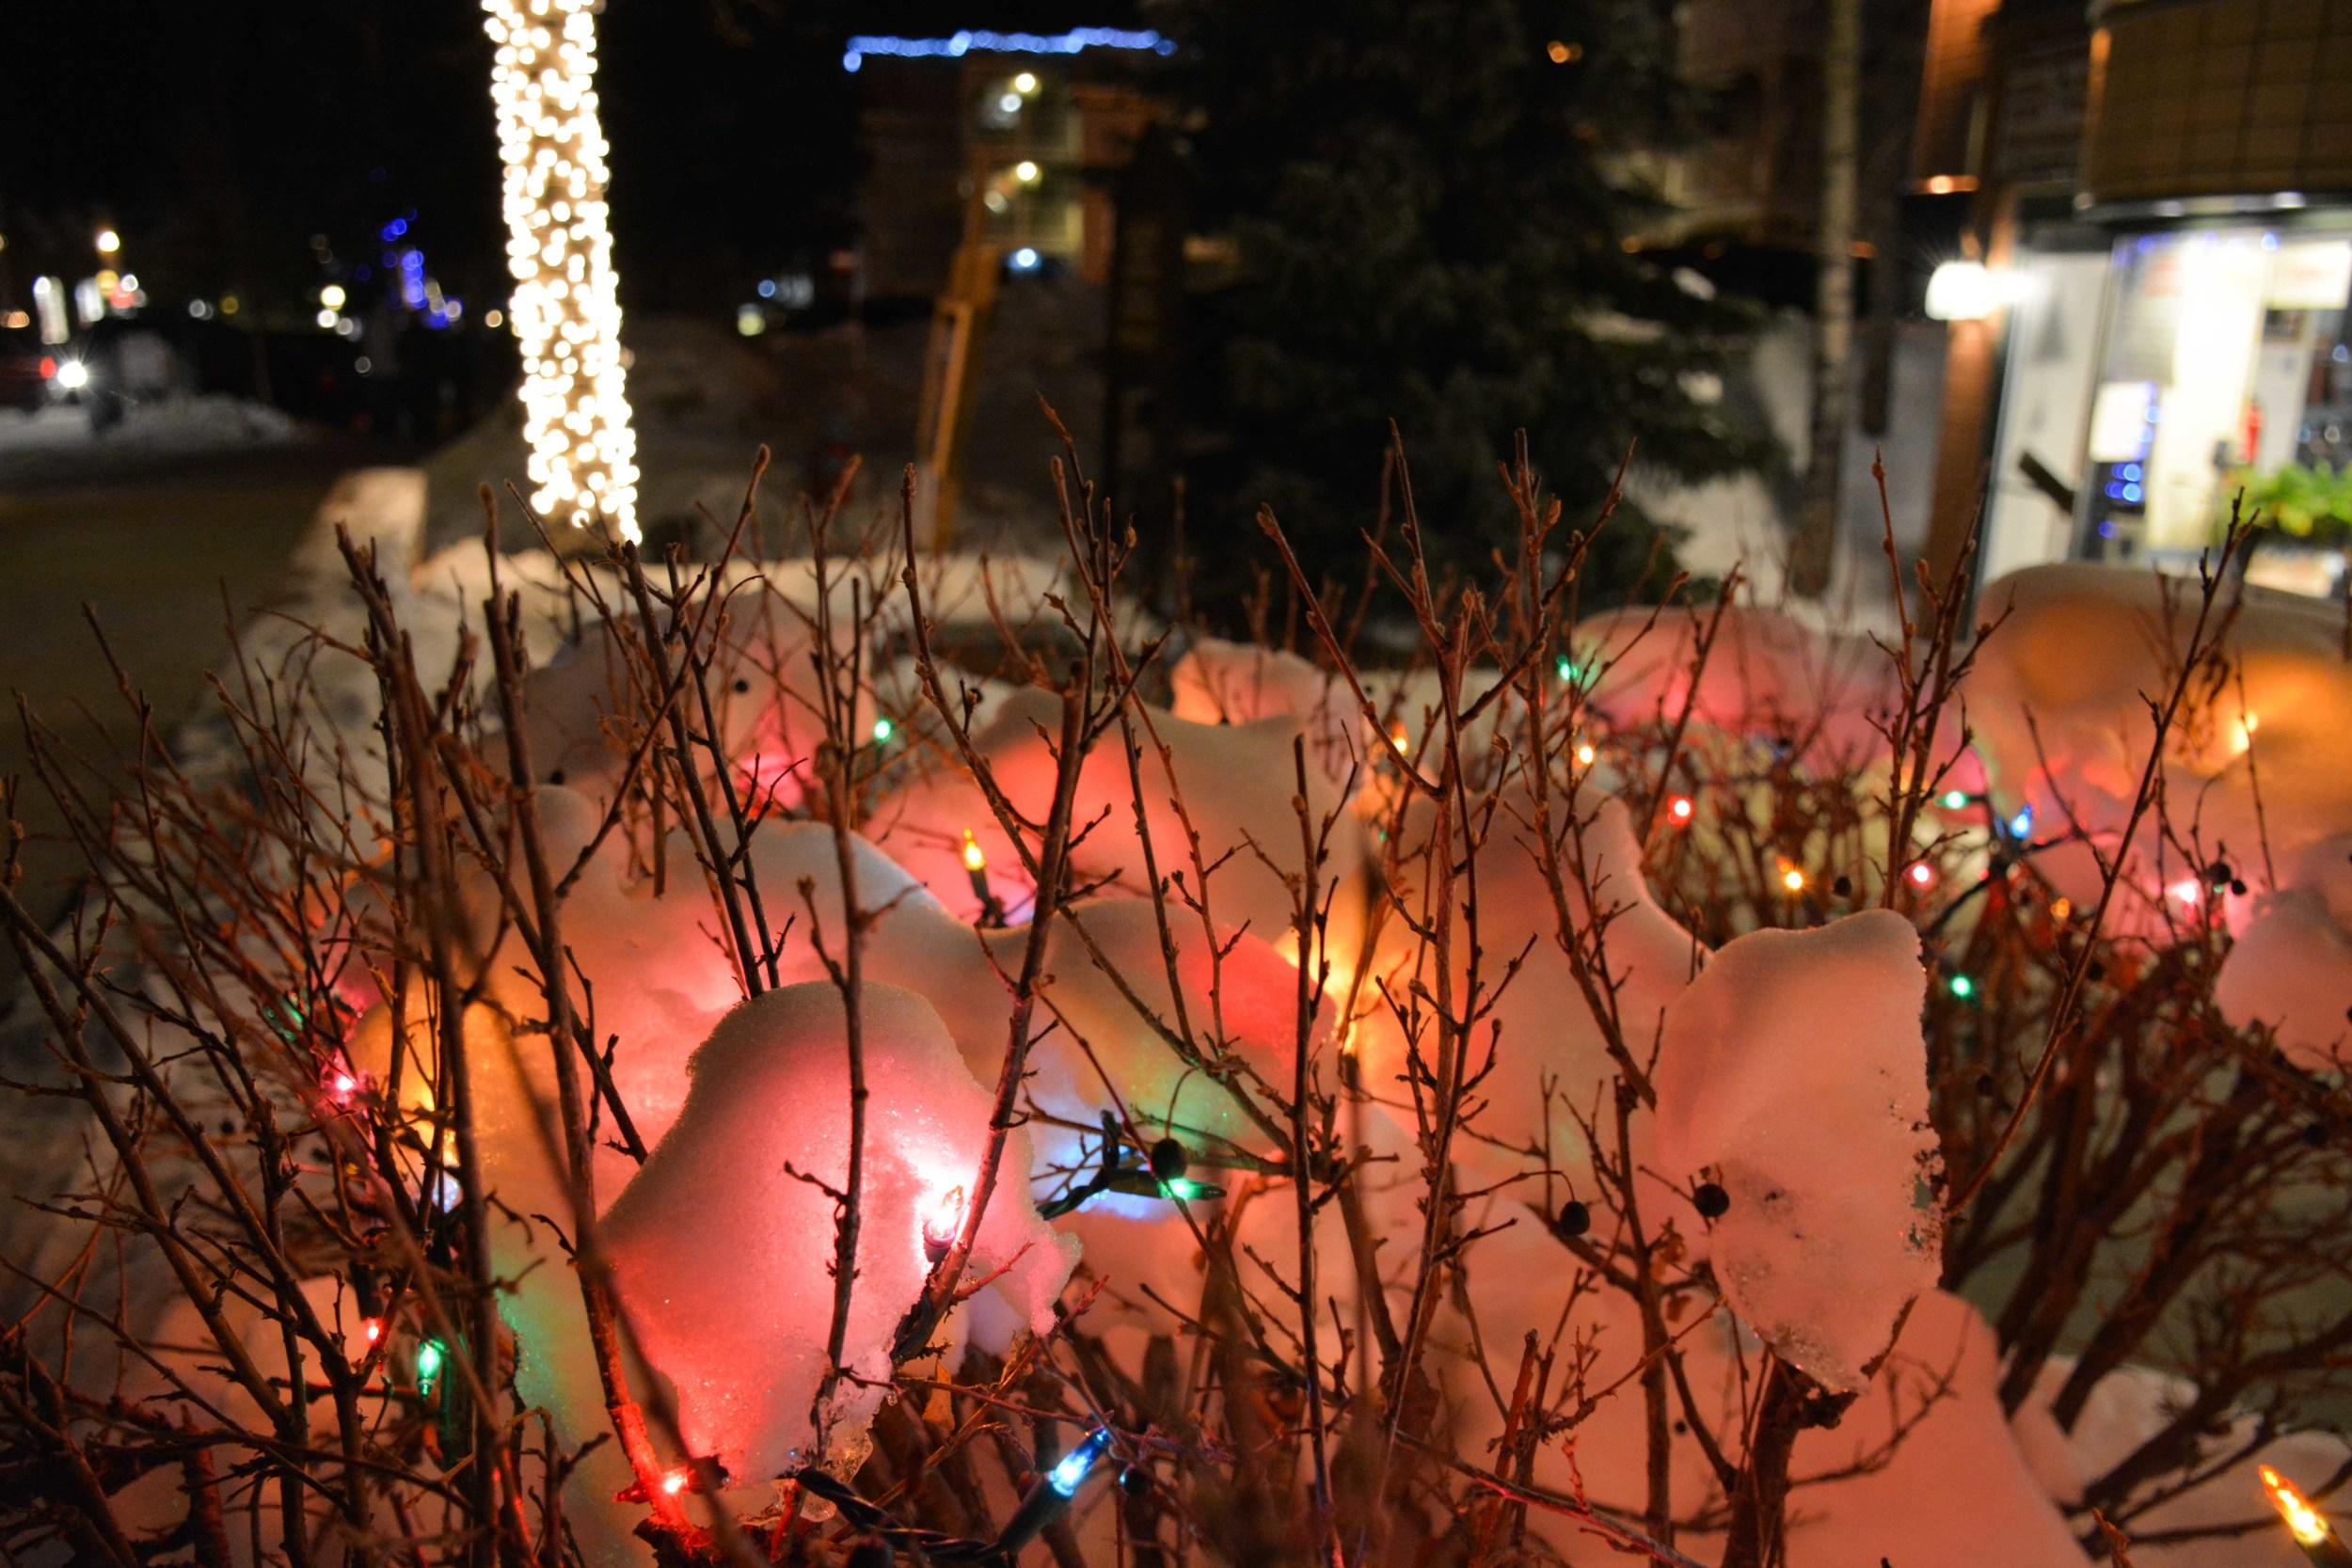 Festive Lights in Breckenridge